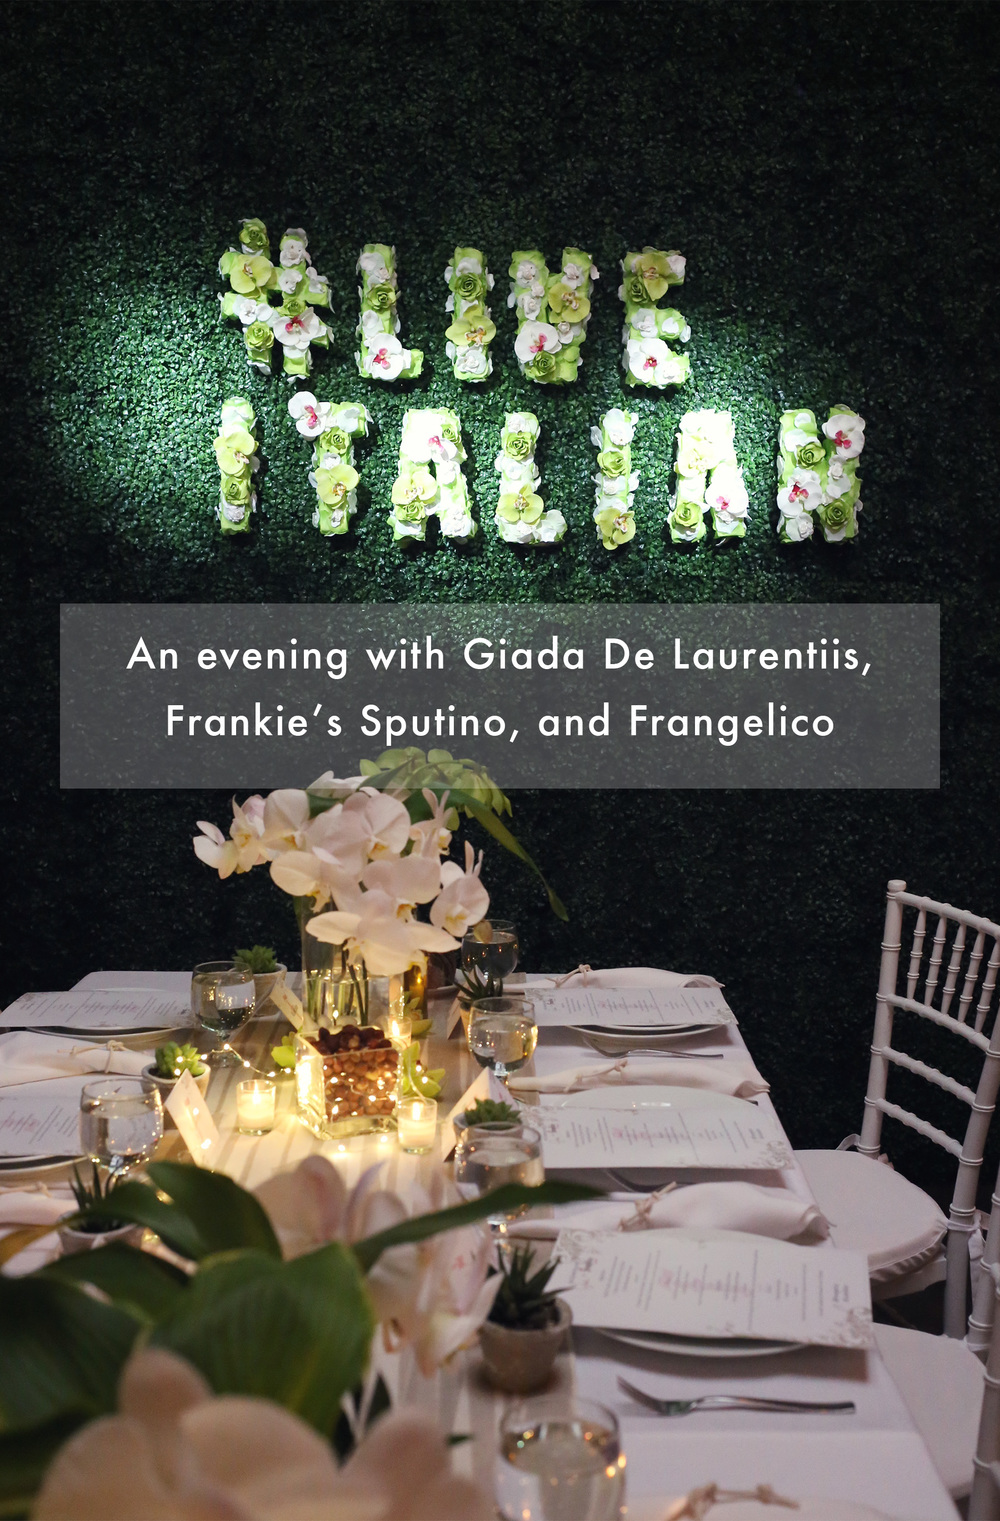 #LiveItalian with Giada